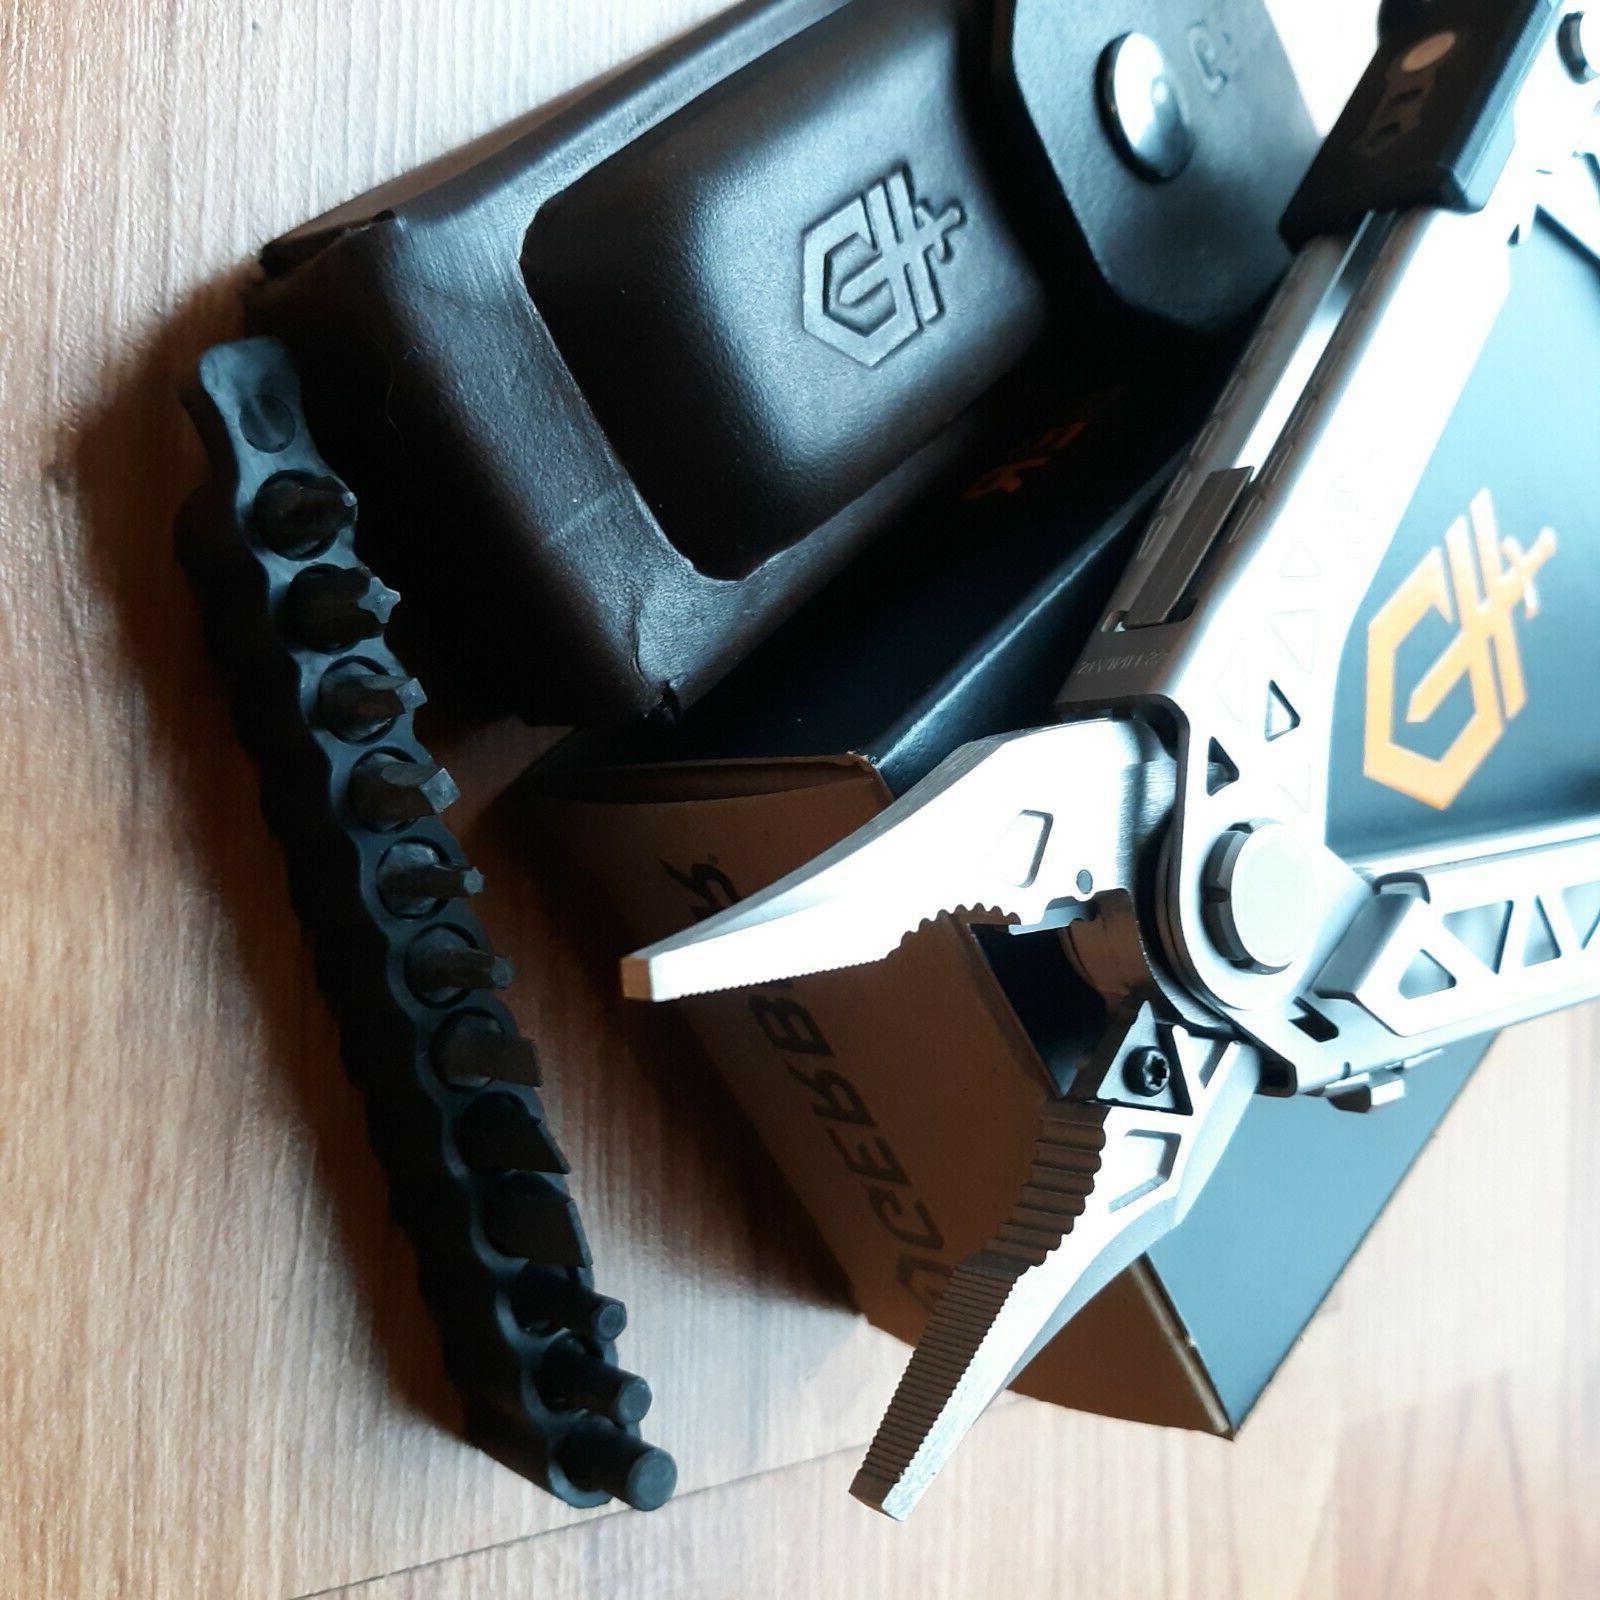 Gerber Center Bits Multi-Tool Belt 1417